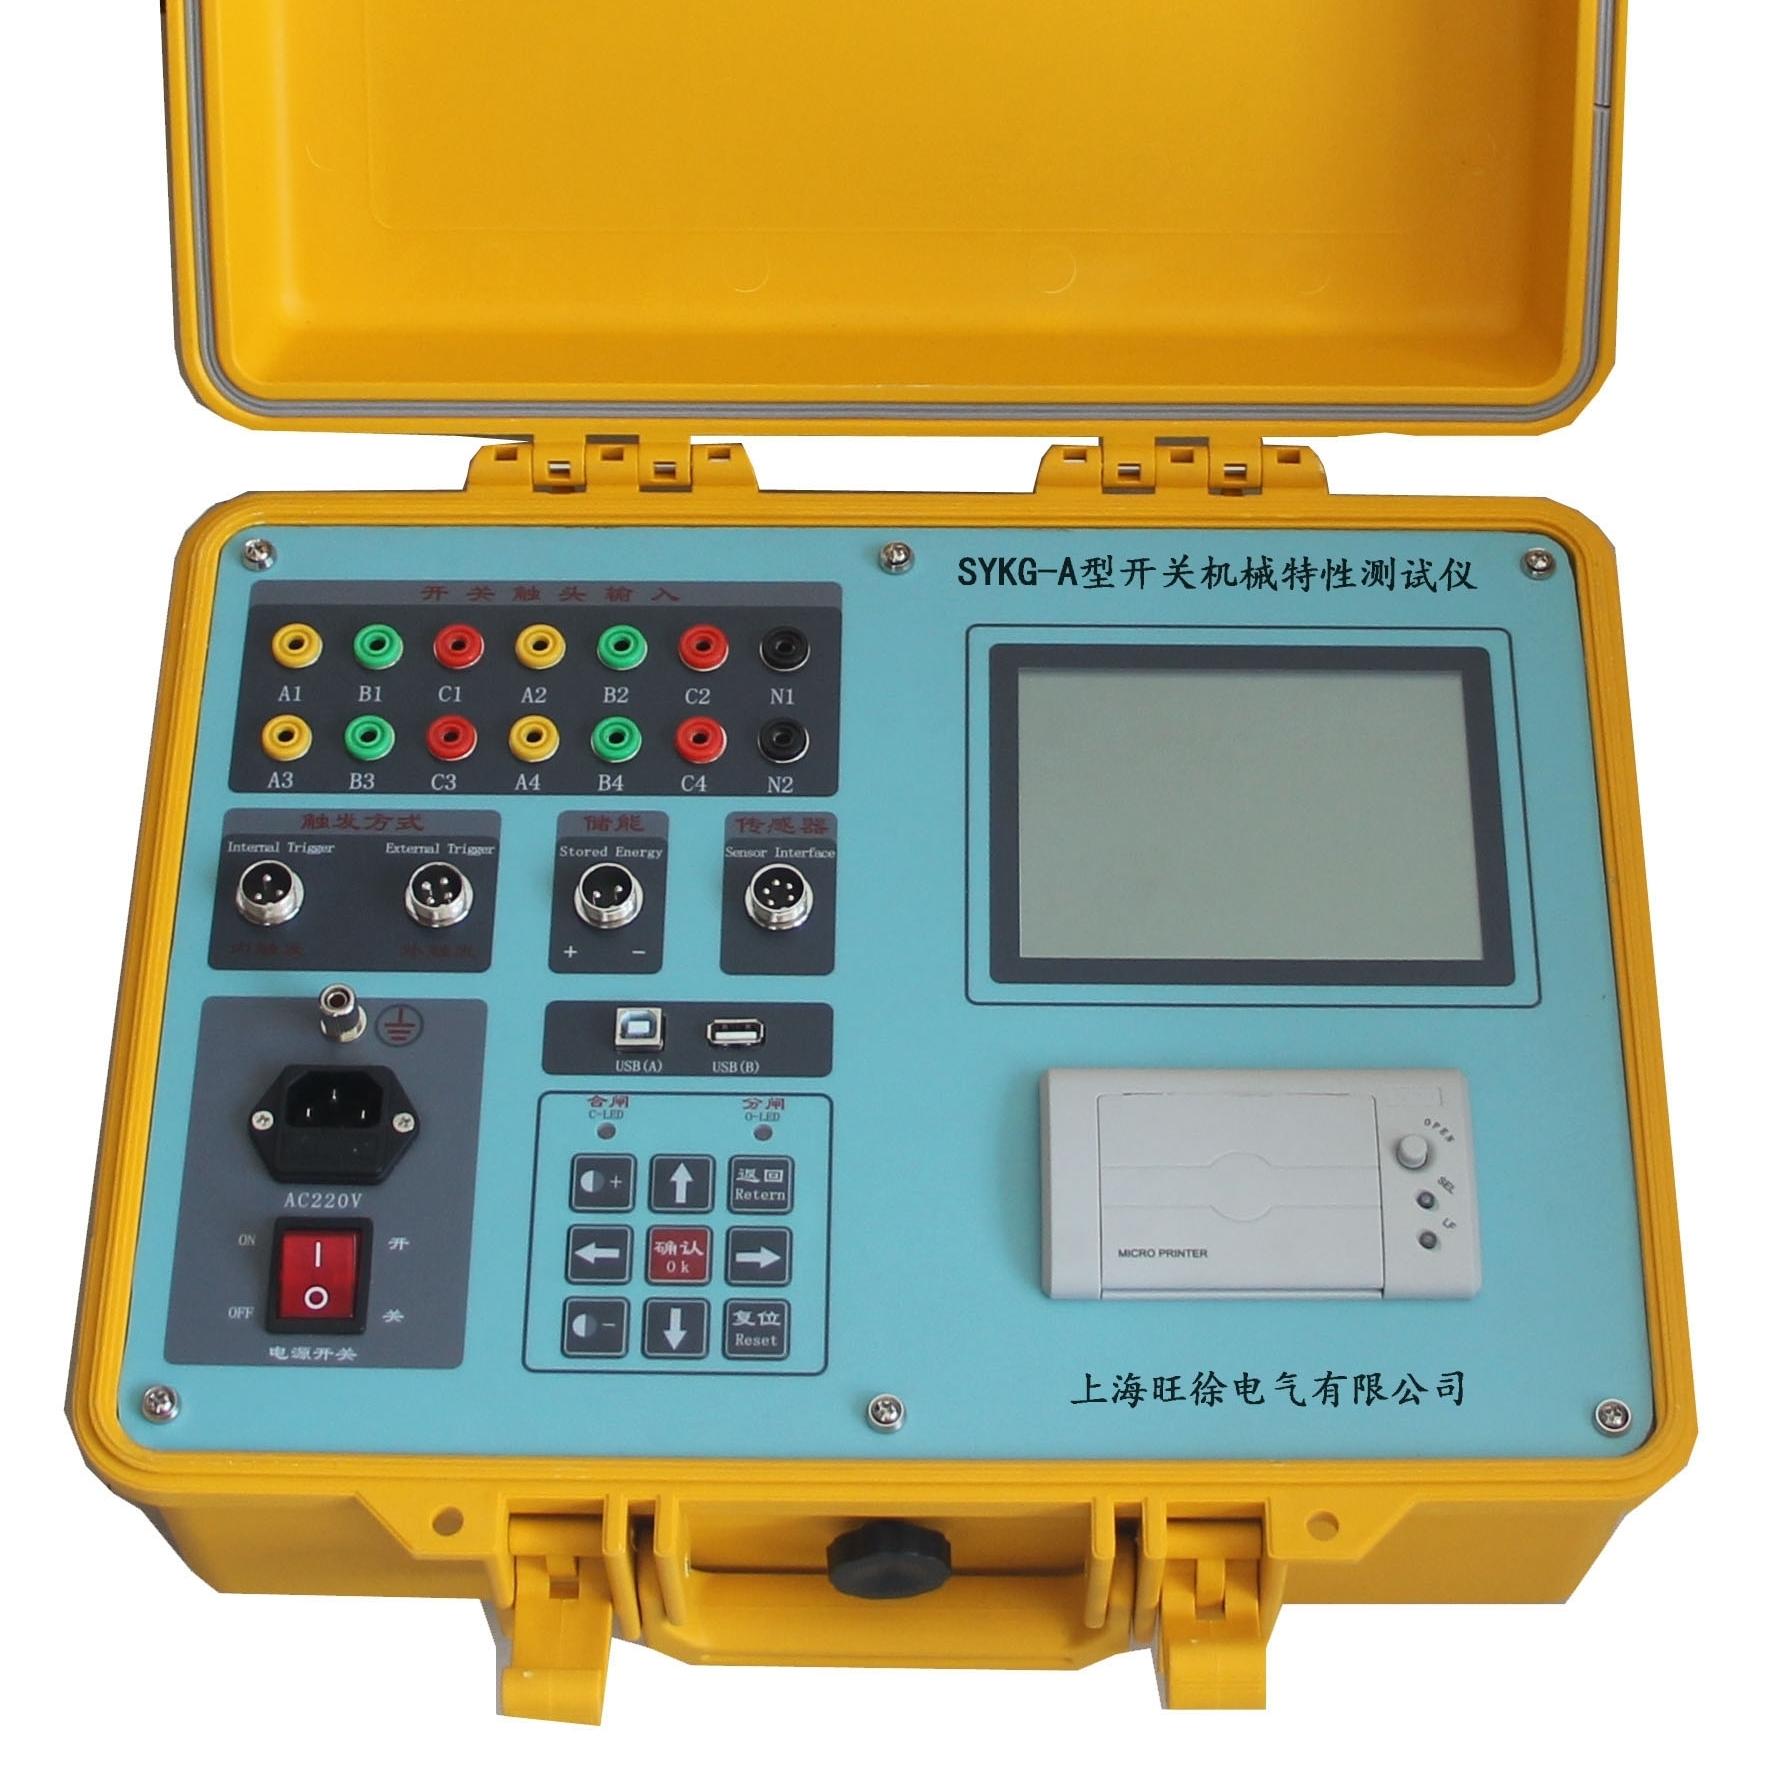 KJTC—Ⅲ(B) 开关机械特性测试仪